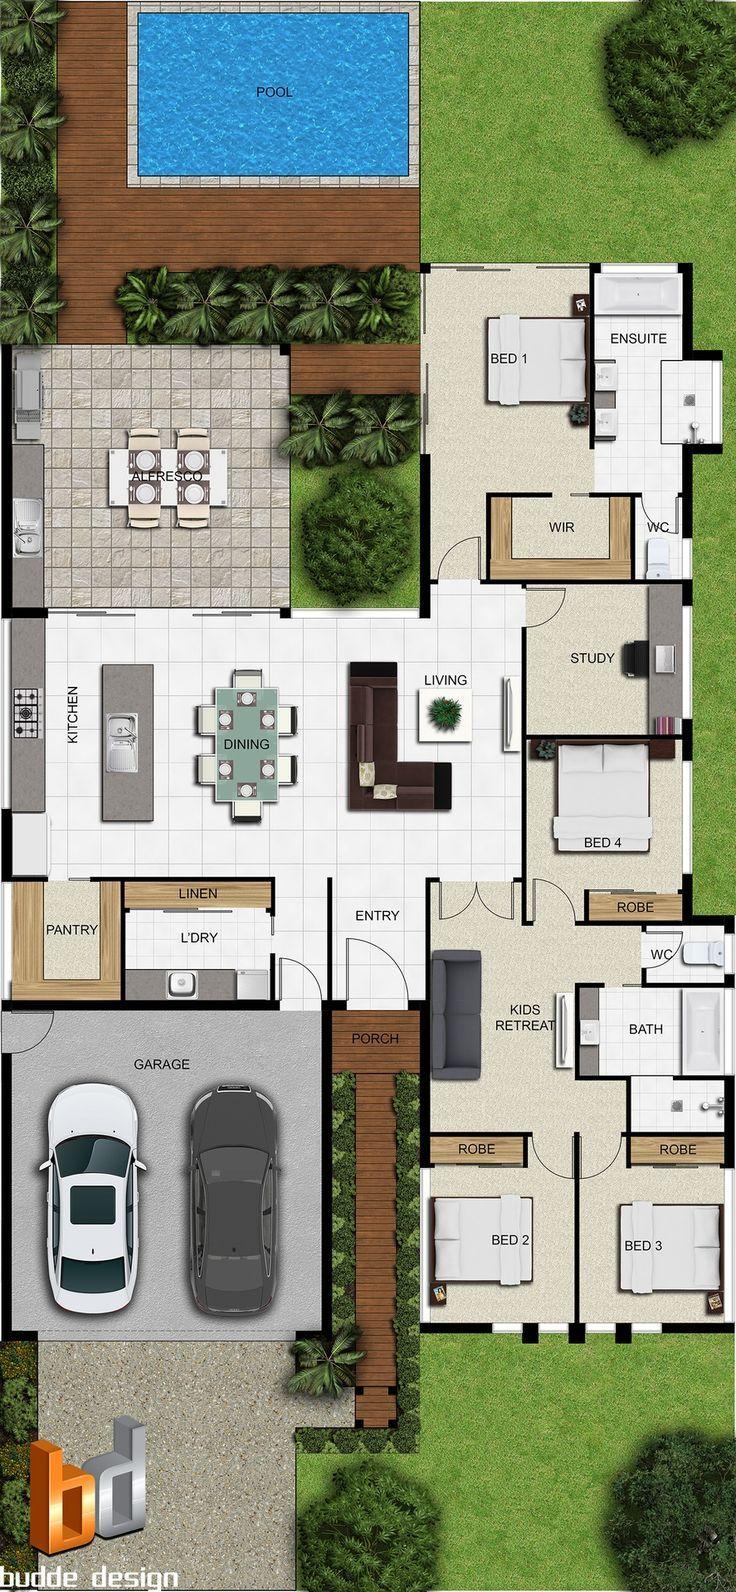 New home inspiratoin Haus pläne, Haus architektur, Haus